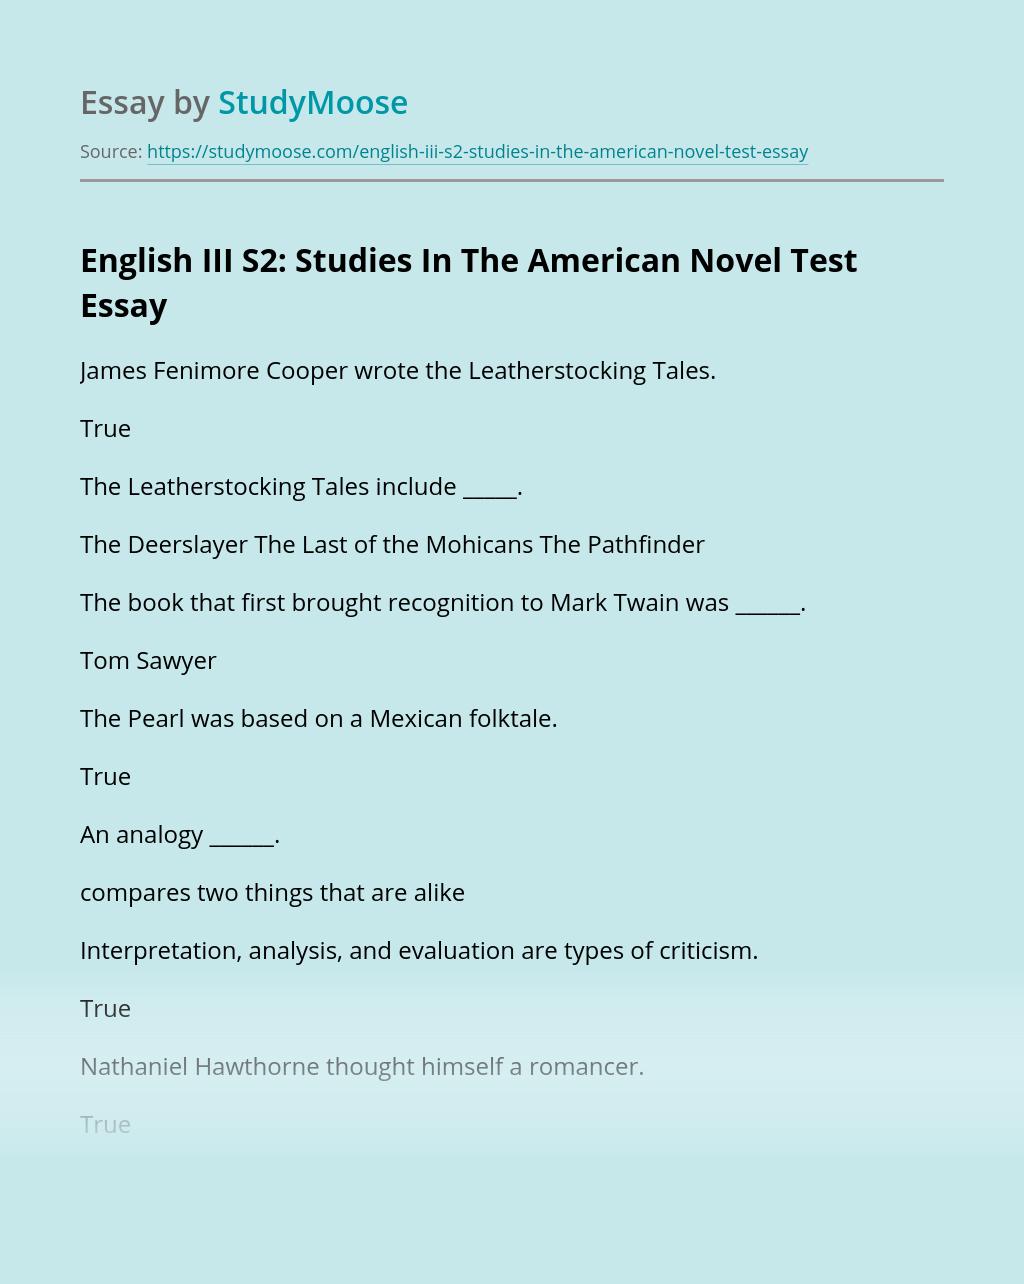 English III S2: Studies In The American Novel Test